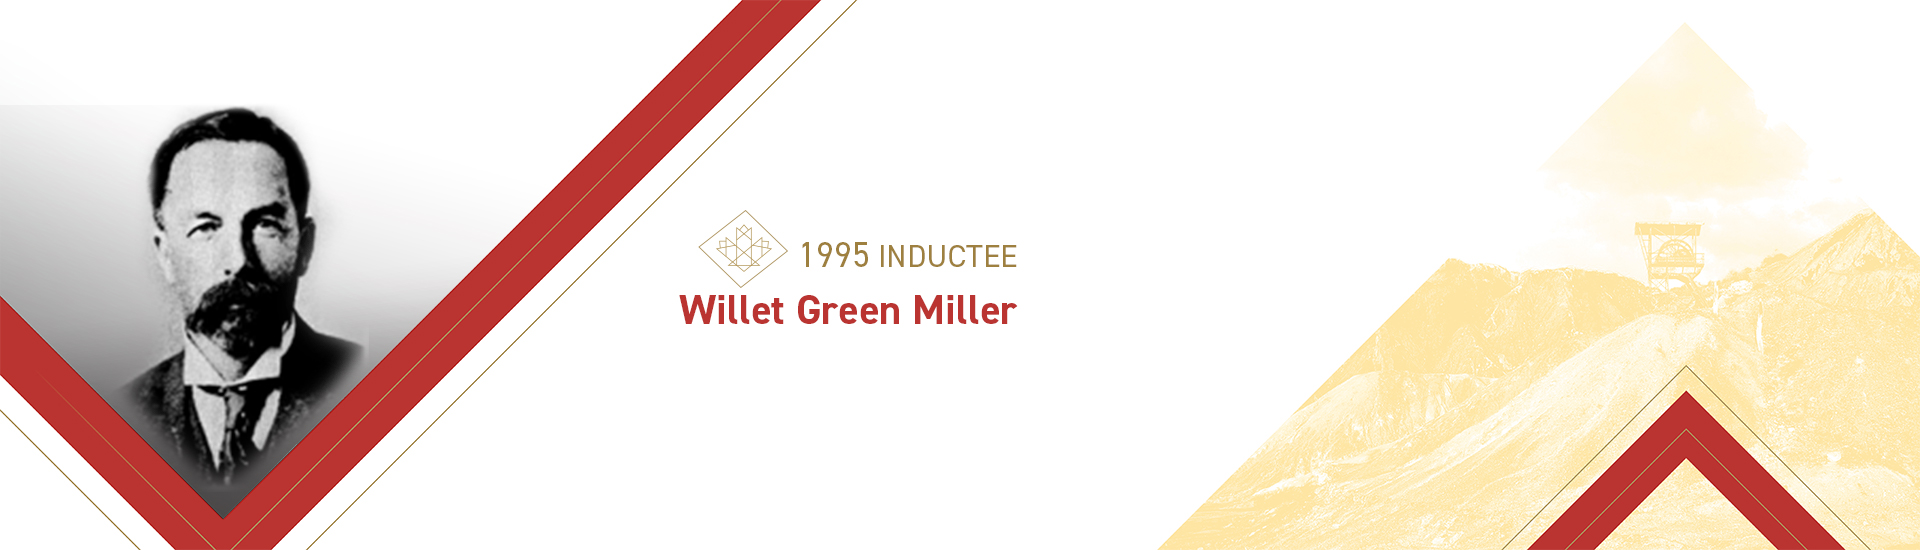 Willet Green Miller (1866 – 1925)